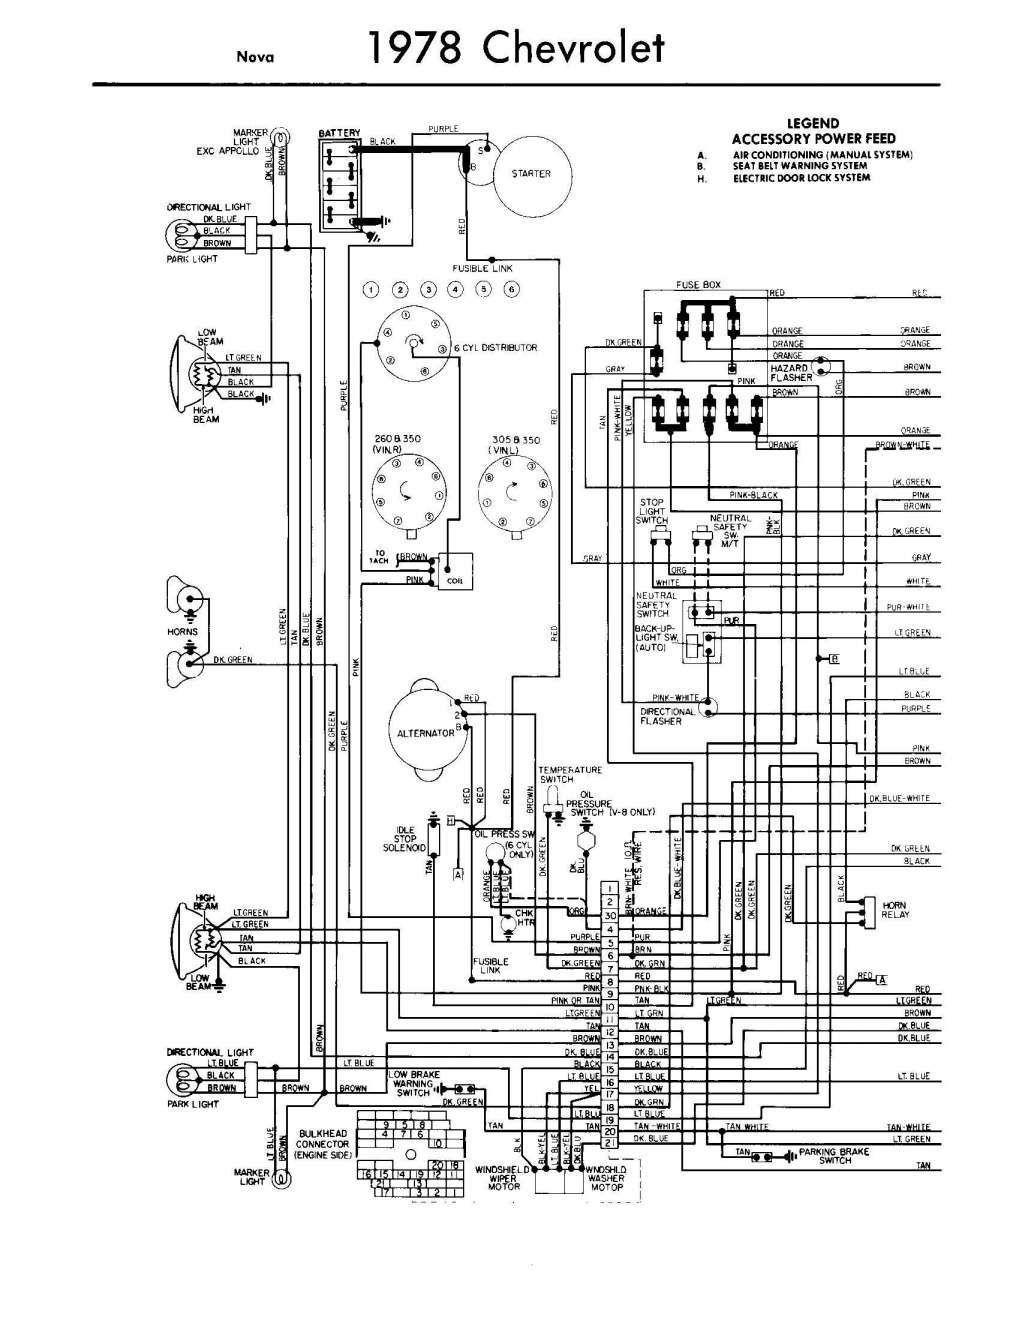 12 78 Gmc Truck Wiring Diagram Chevy Trucks 1985 Chevy Truck 1979 Chevy Truck